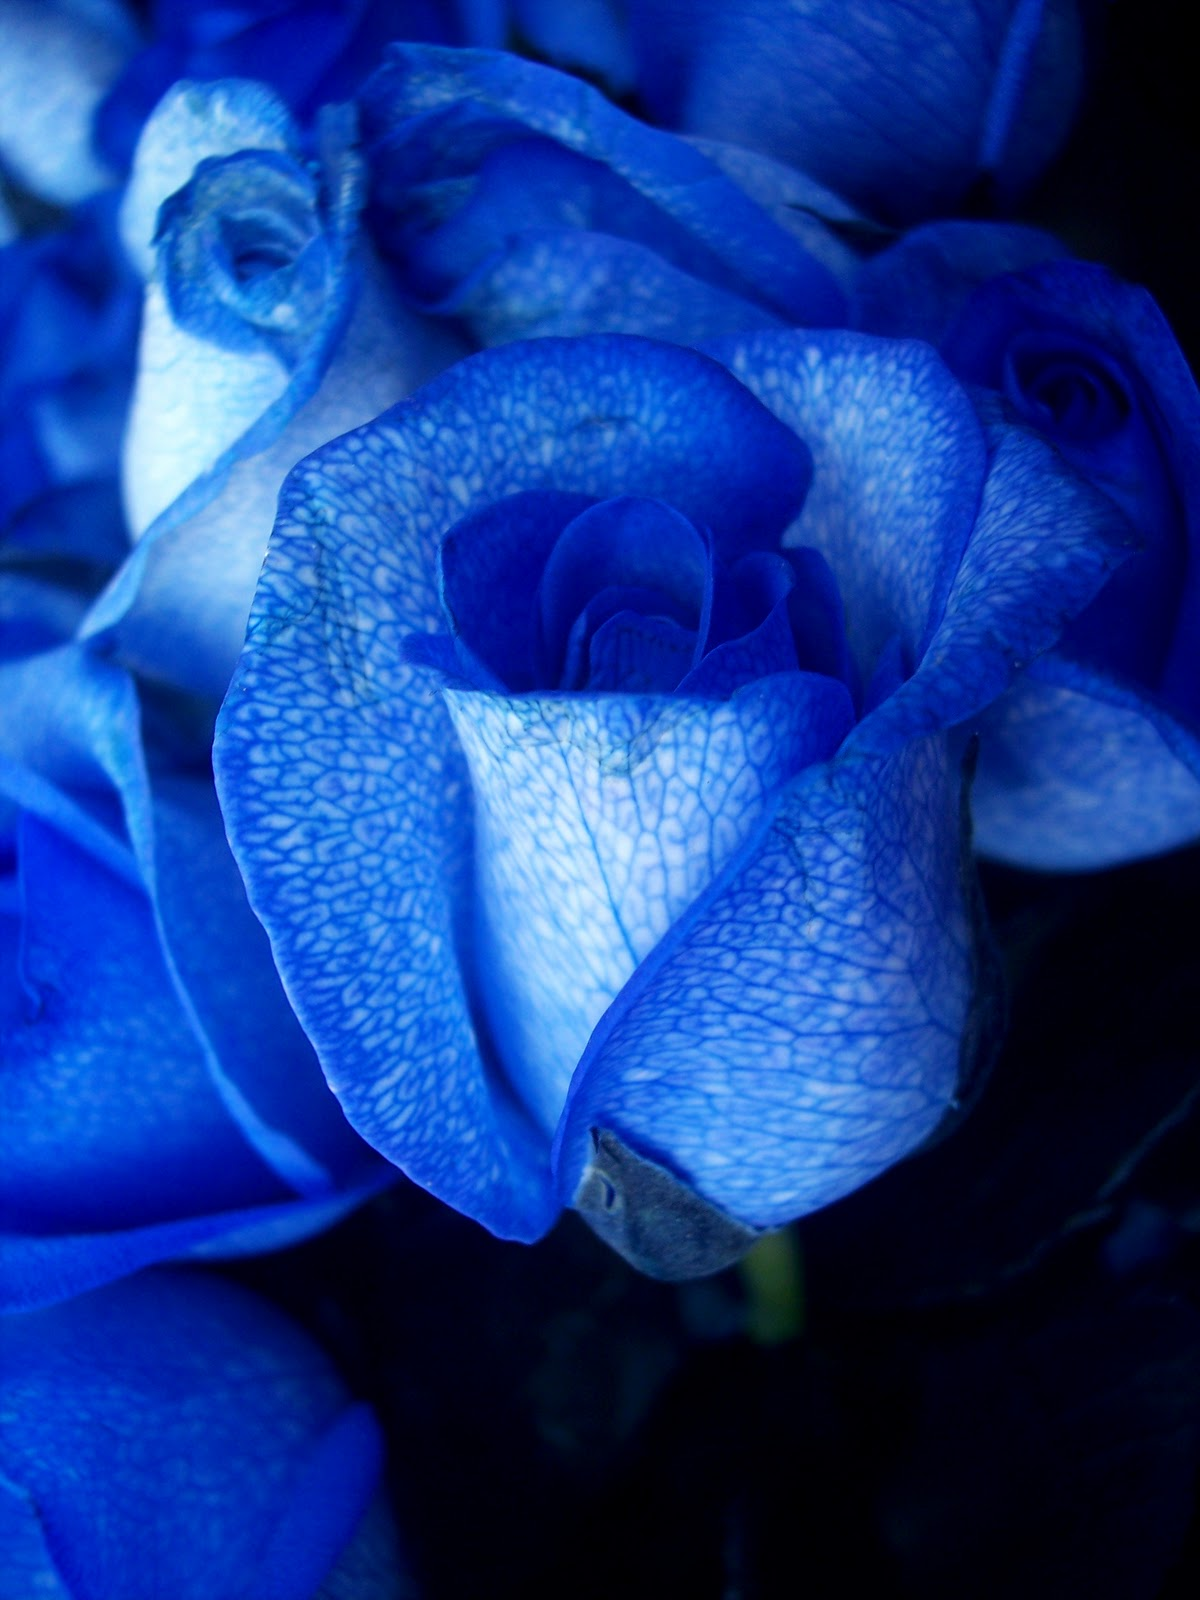 of blue rose flowe...